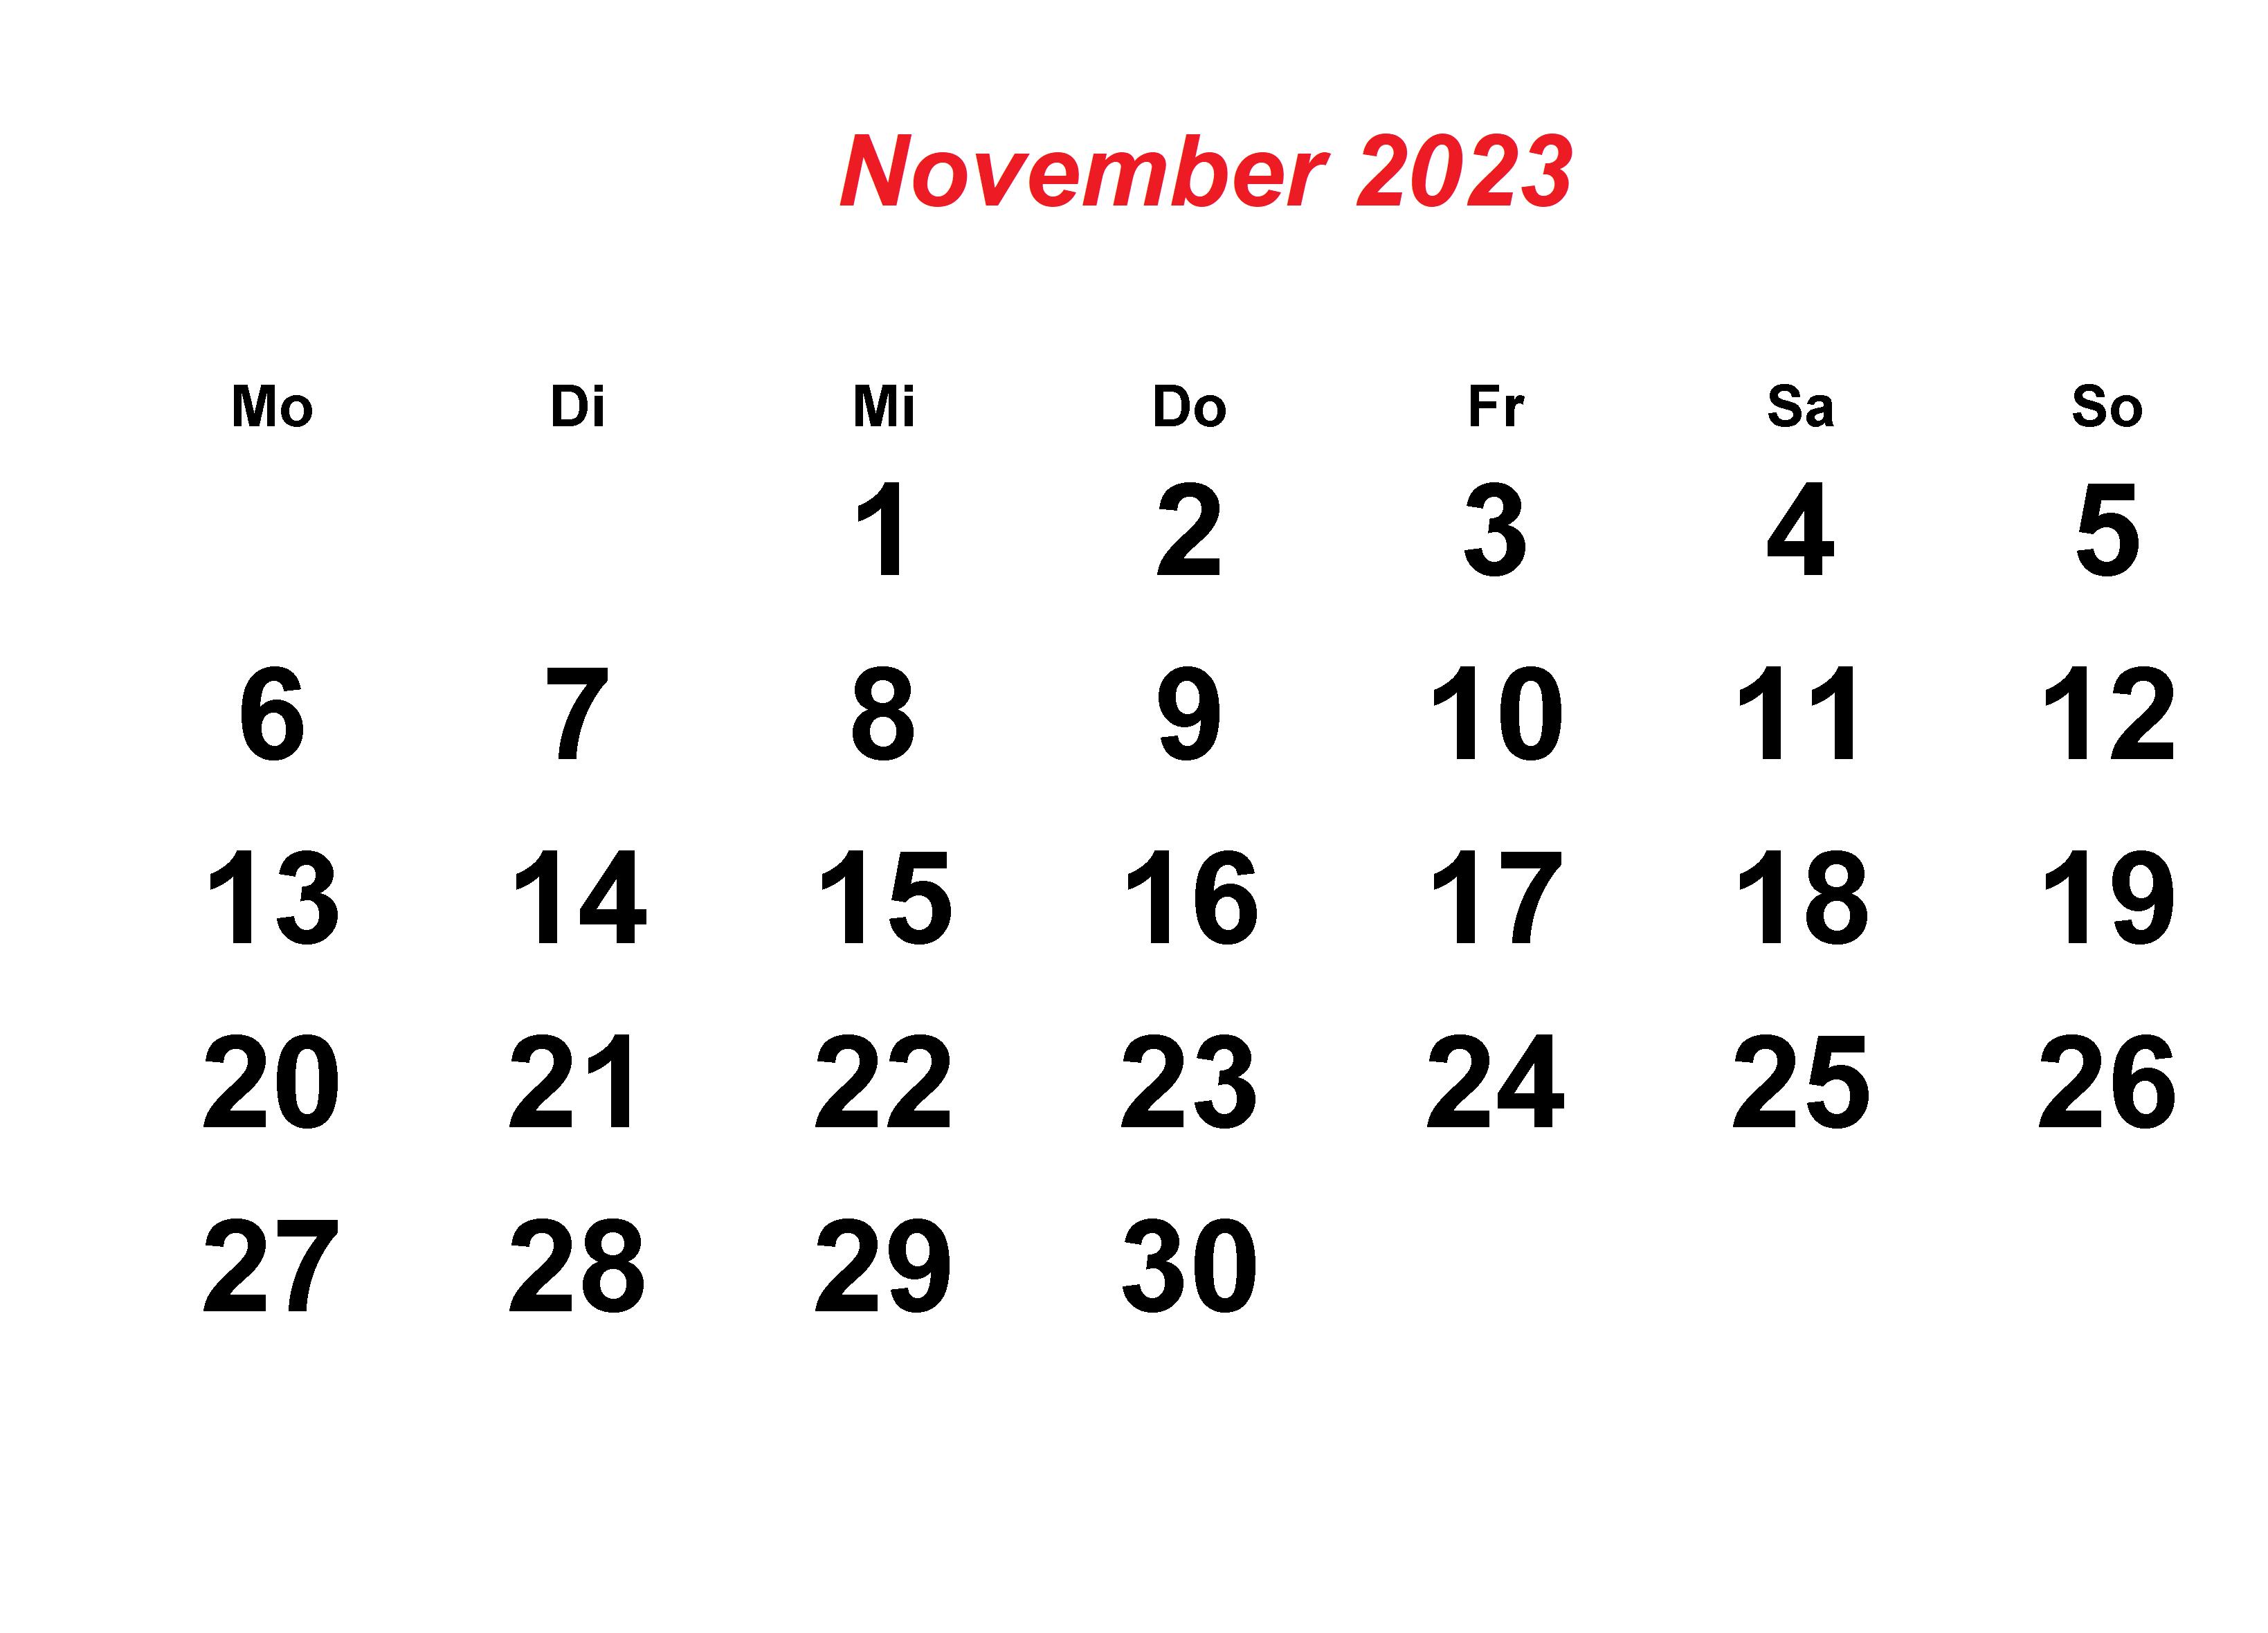 November 2023 Kalender Ausdrucken